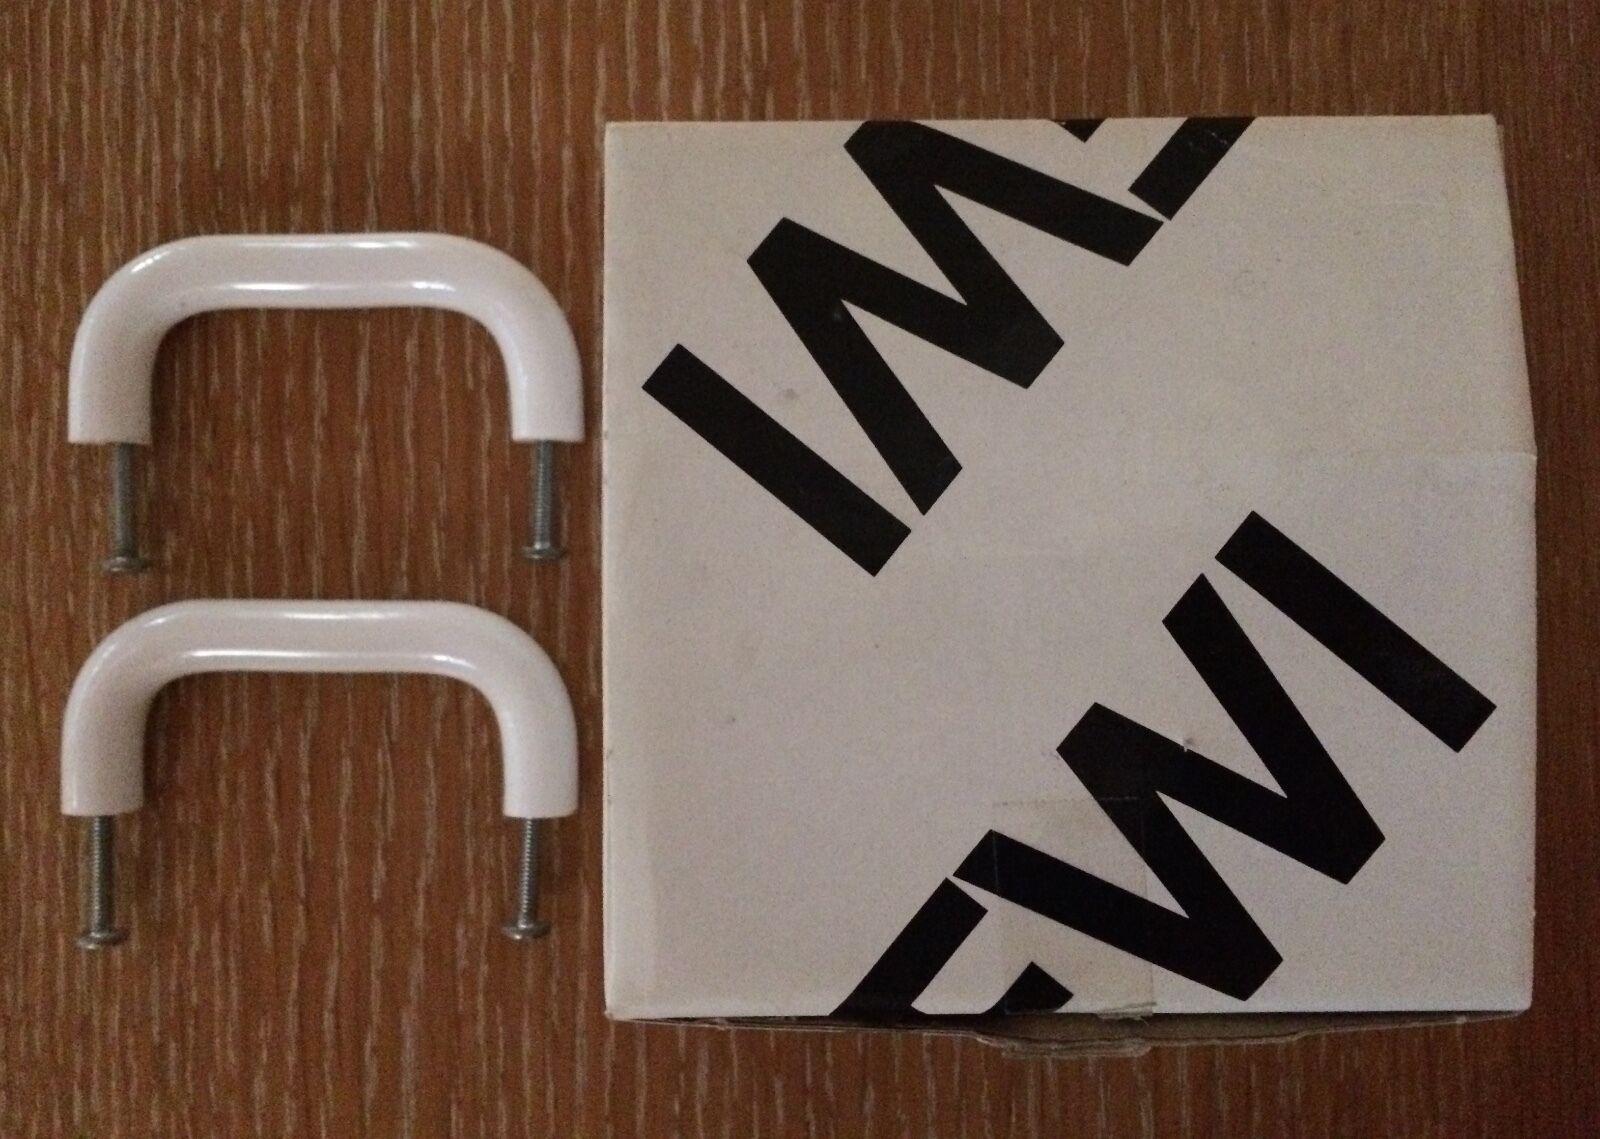 HEWI  548.86  furniture/cabinet pull high quality polyamide Weiß 13 pieces NIB